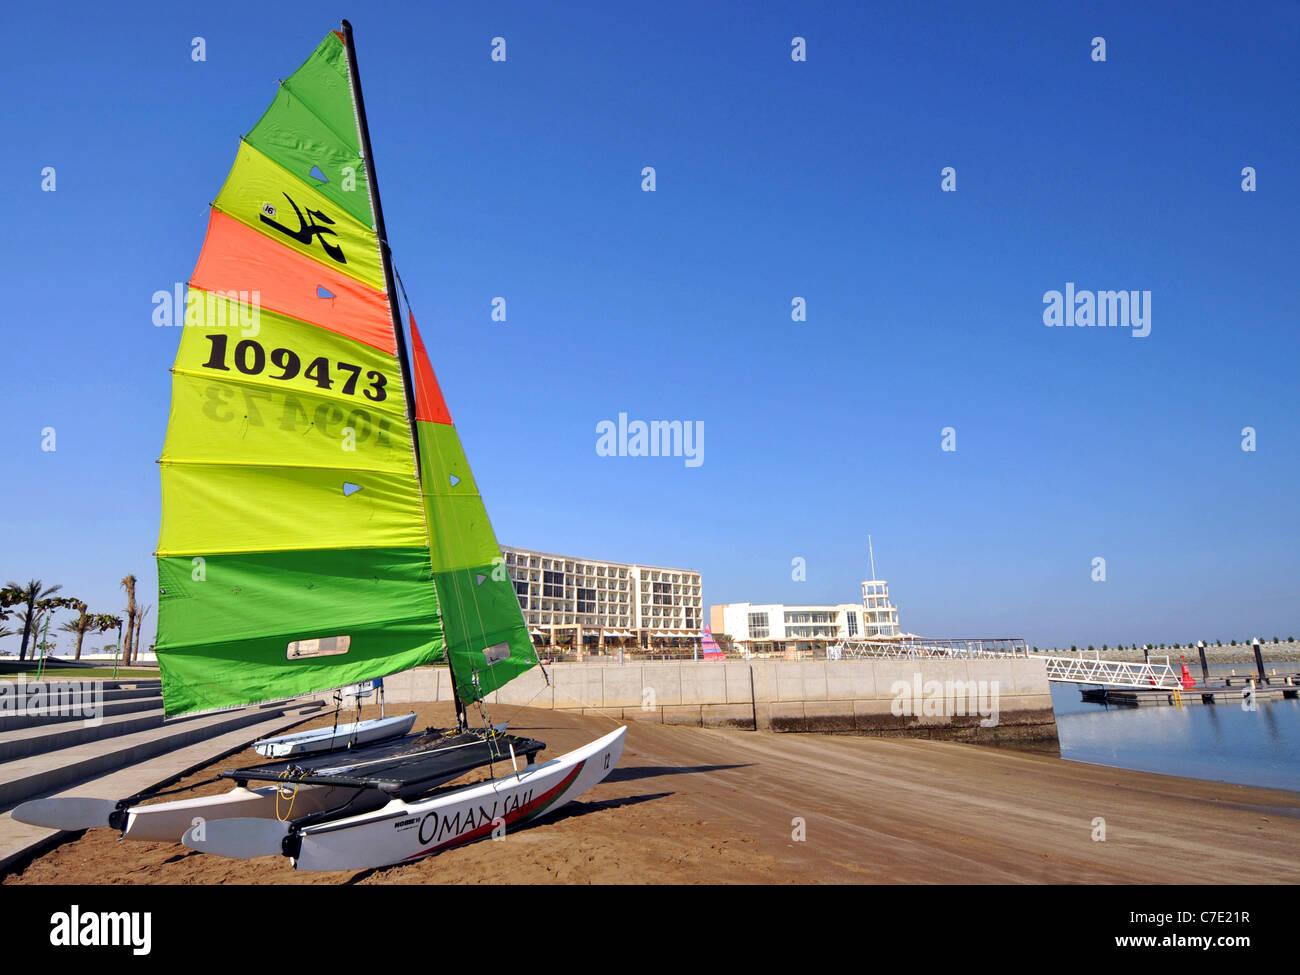 Le Millennium Resort Mussanah, Oman. Photo Stock